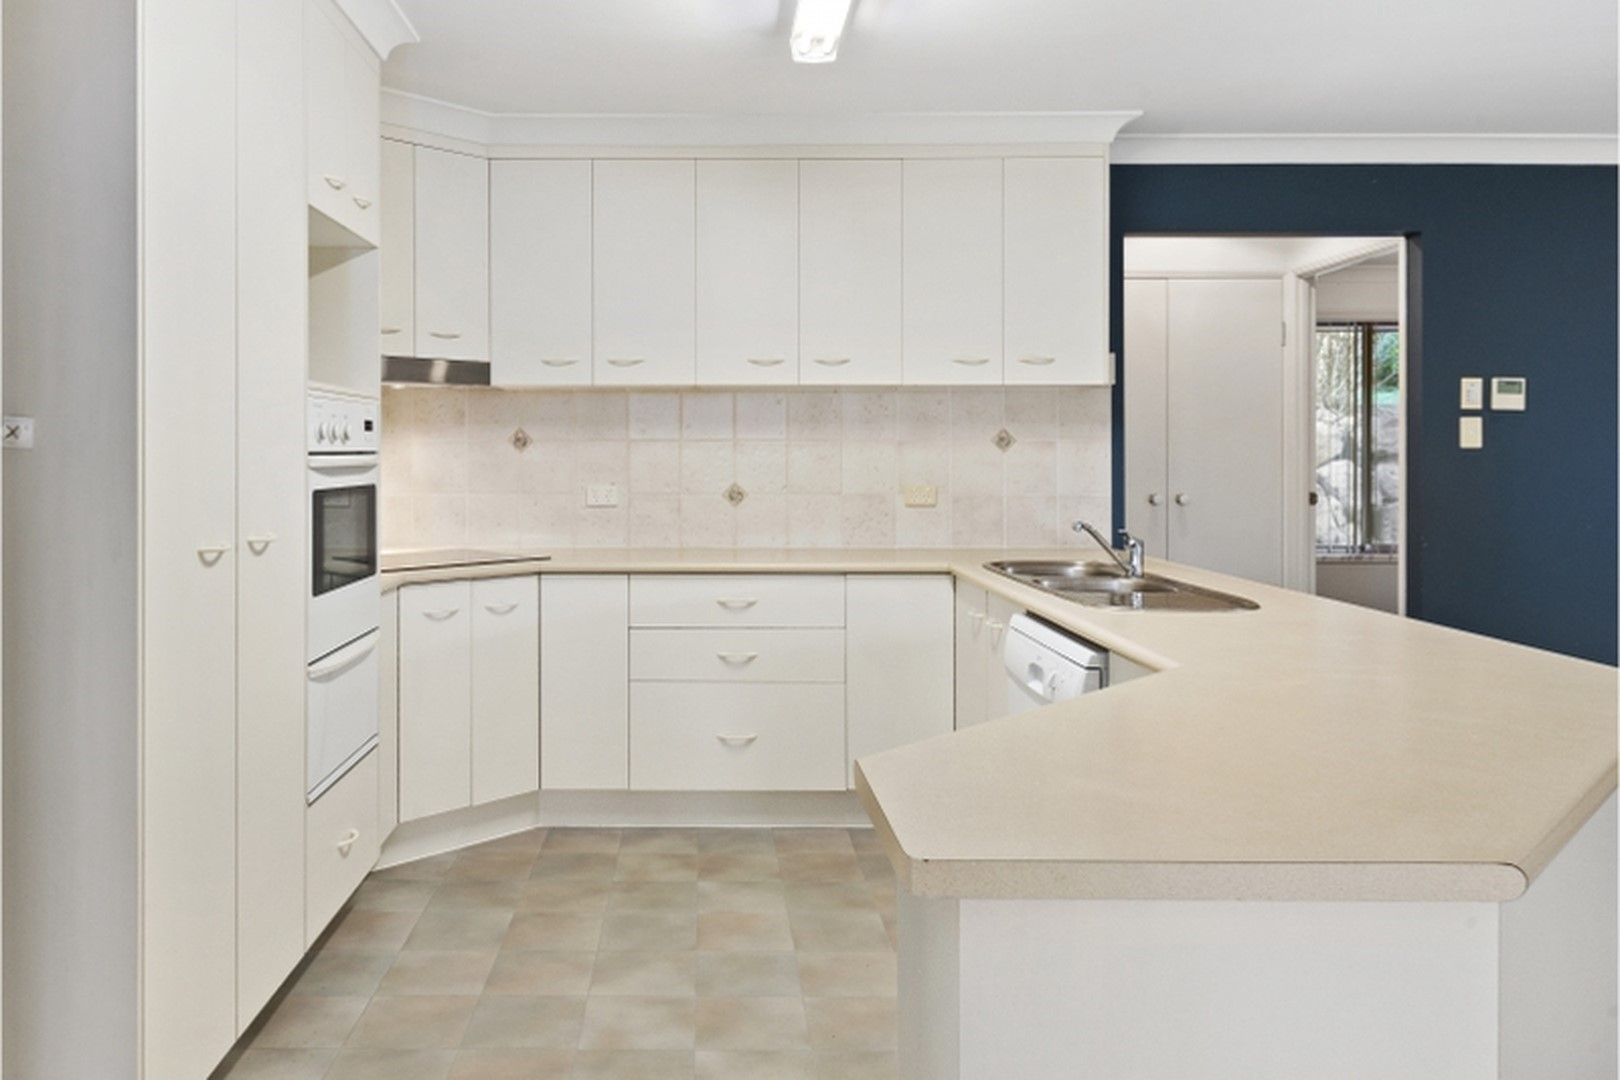 6 Bettina Court, Eatons Hill QLD 4037, Image 2